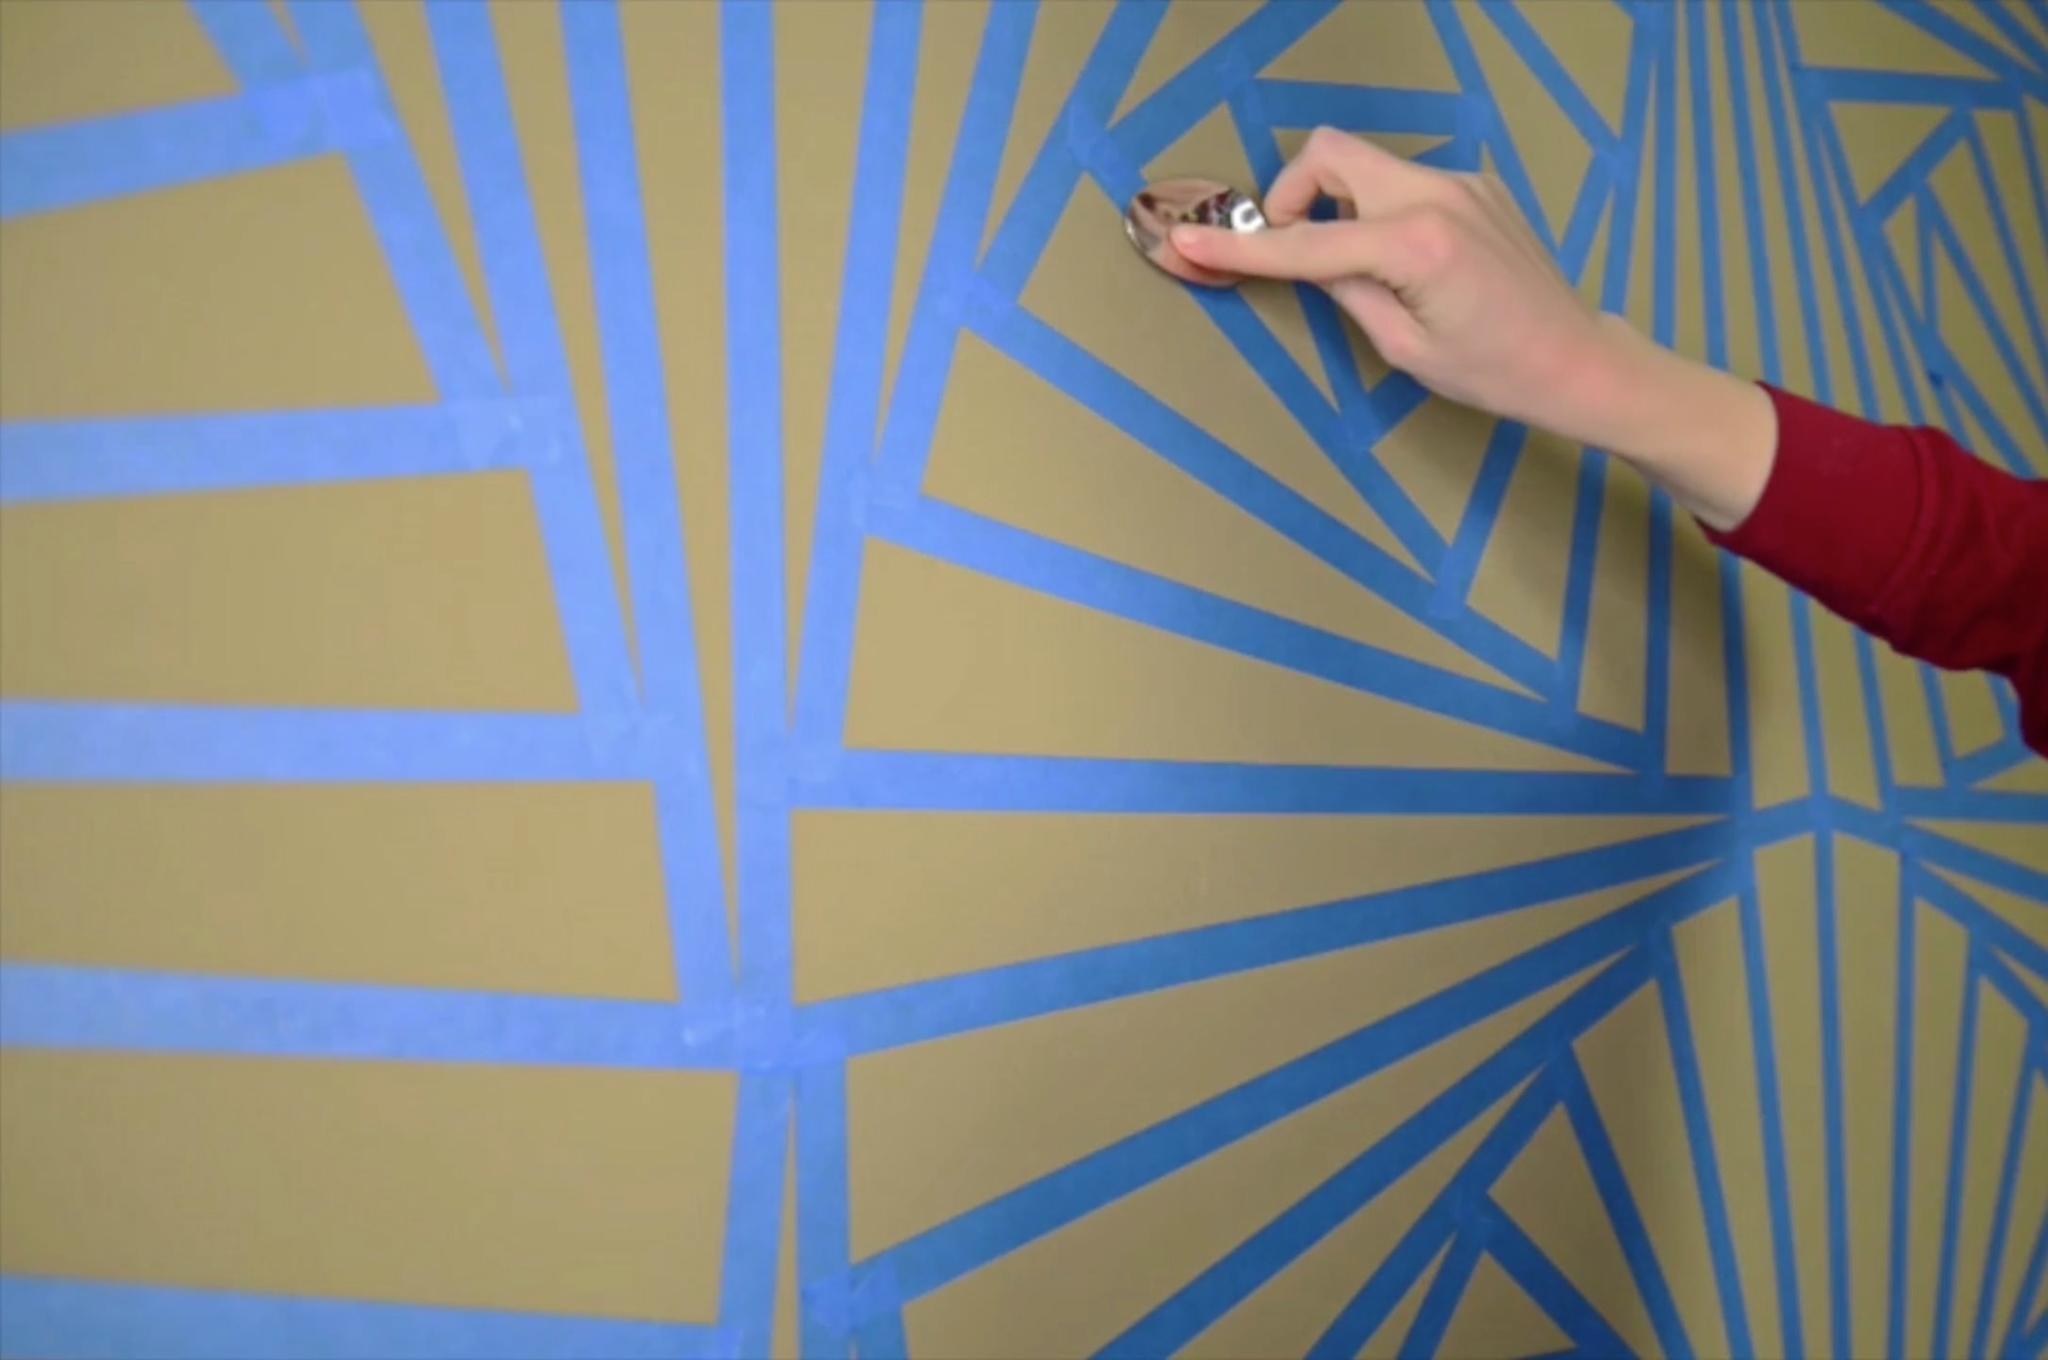 kreative wandbemalung wandbild mit klebeband. Black Bedroom Furniture Sets. Home Design Ideas